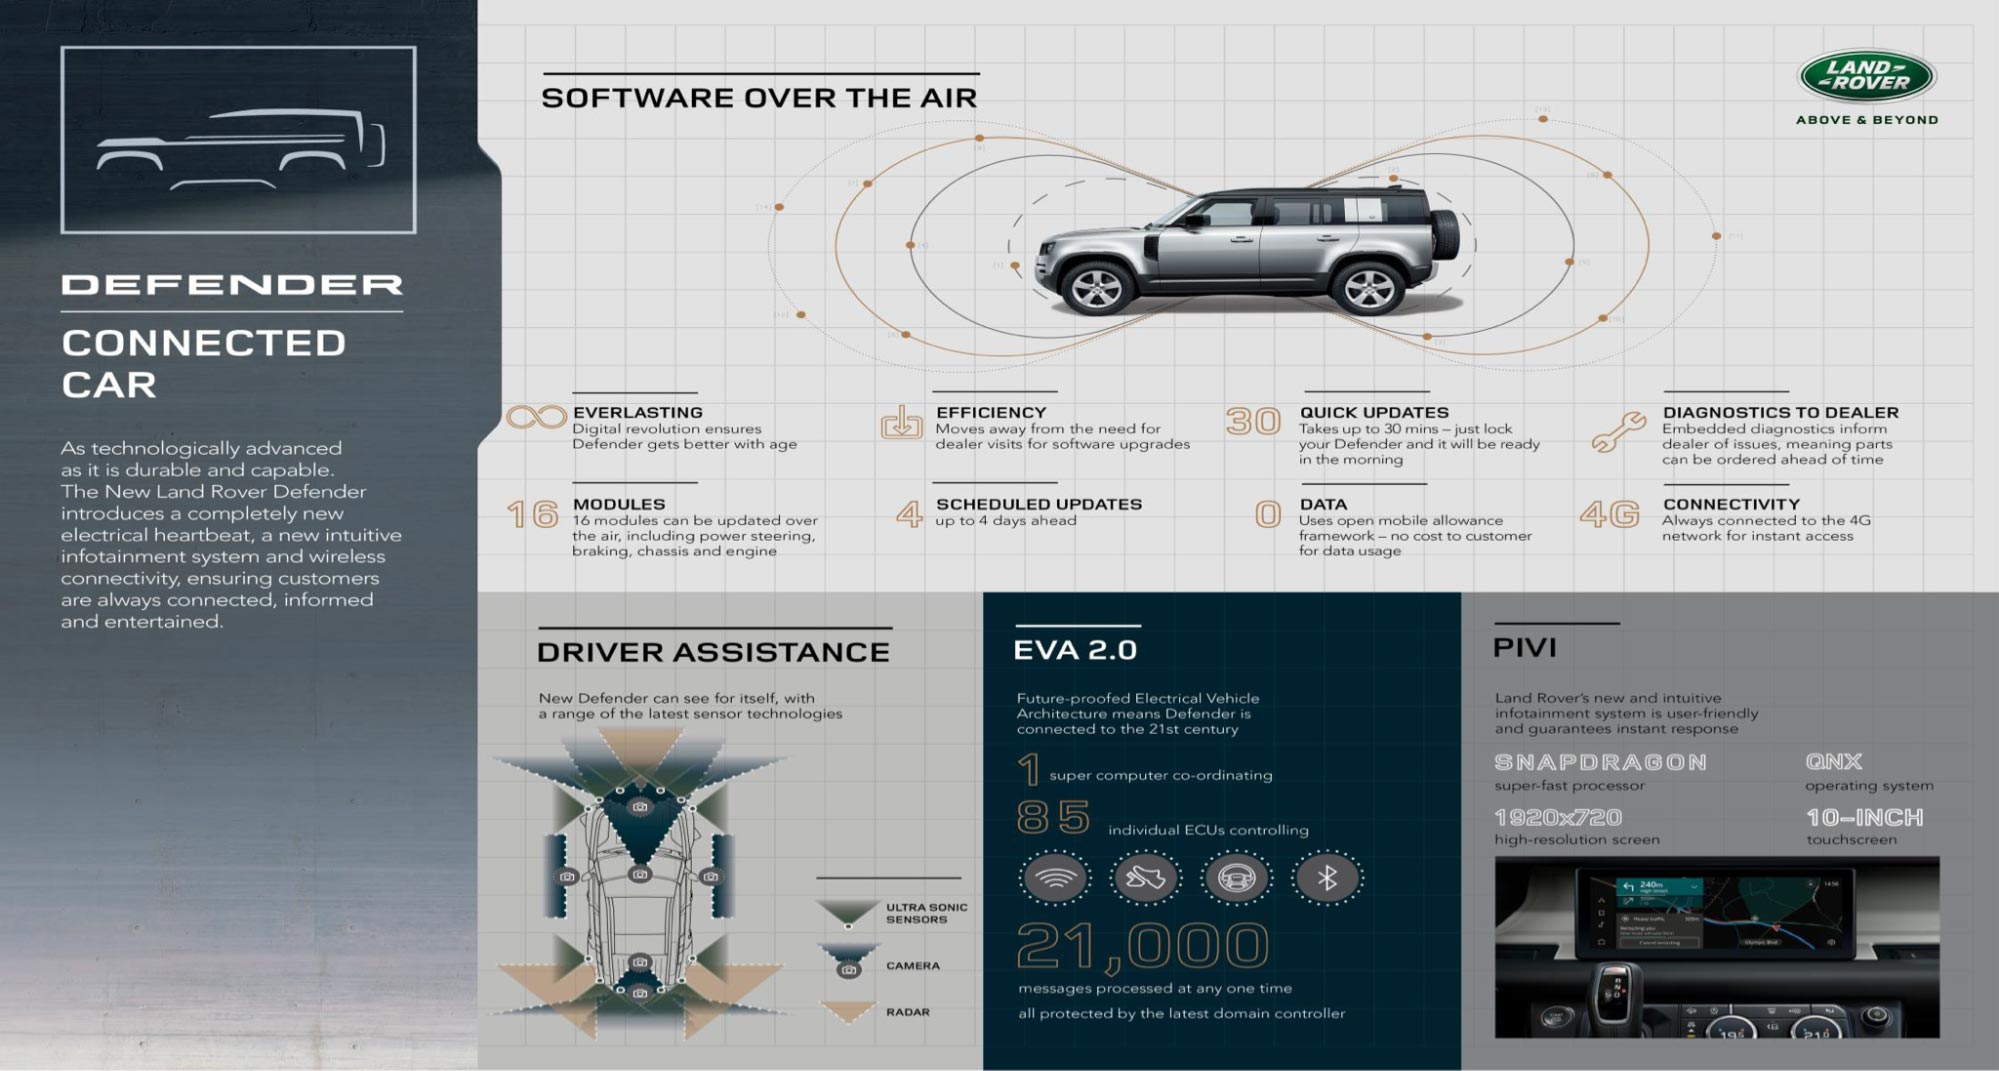 jaguar-defender-connected-car-software-over-the-air.jpg